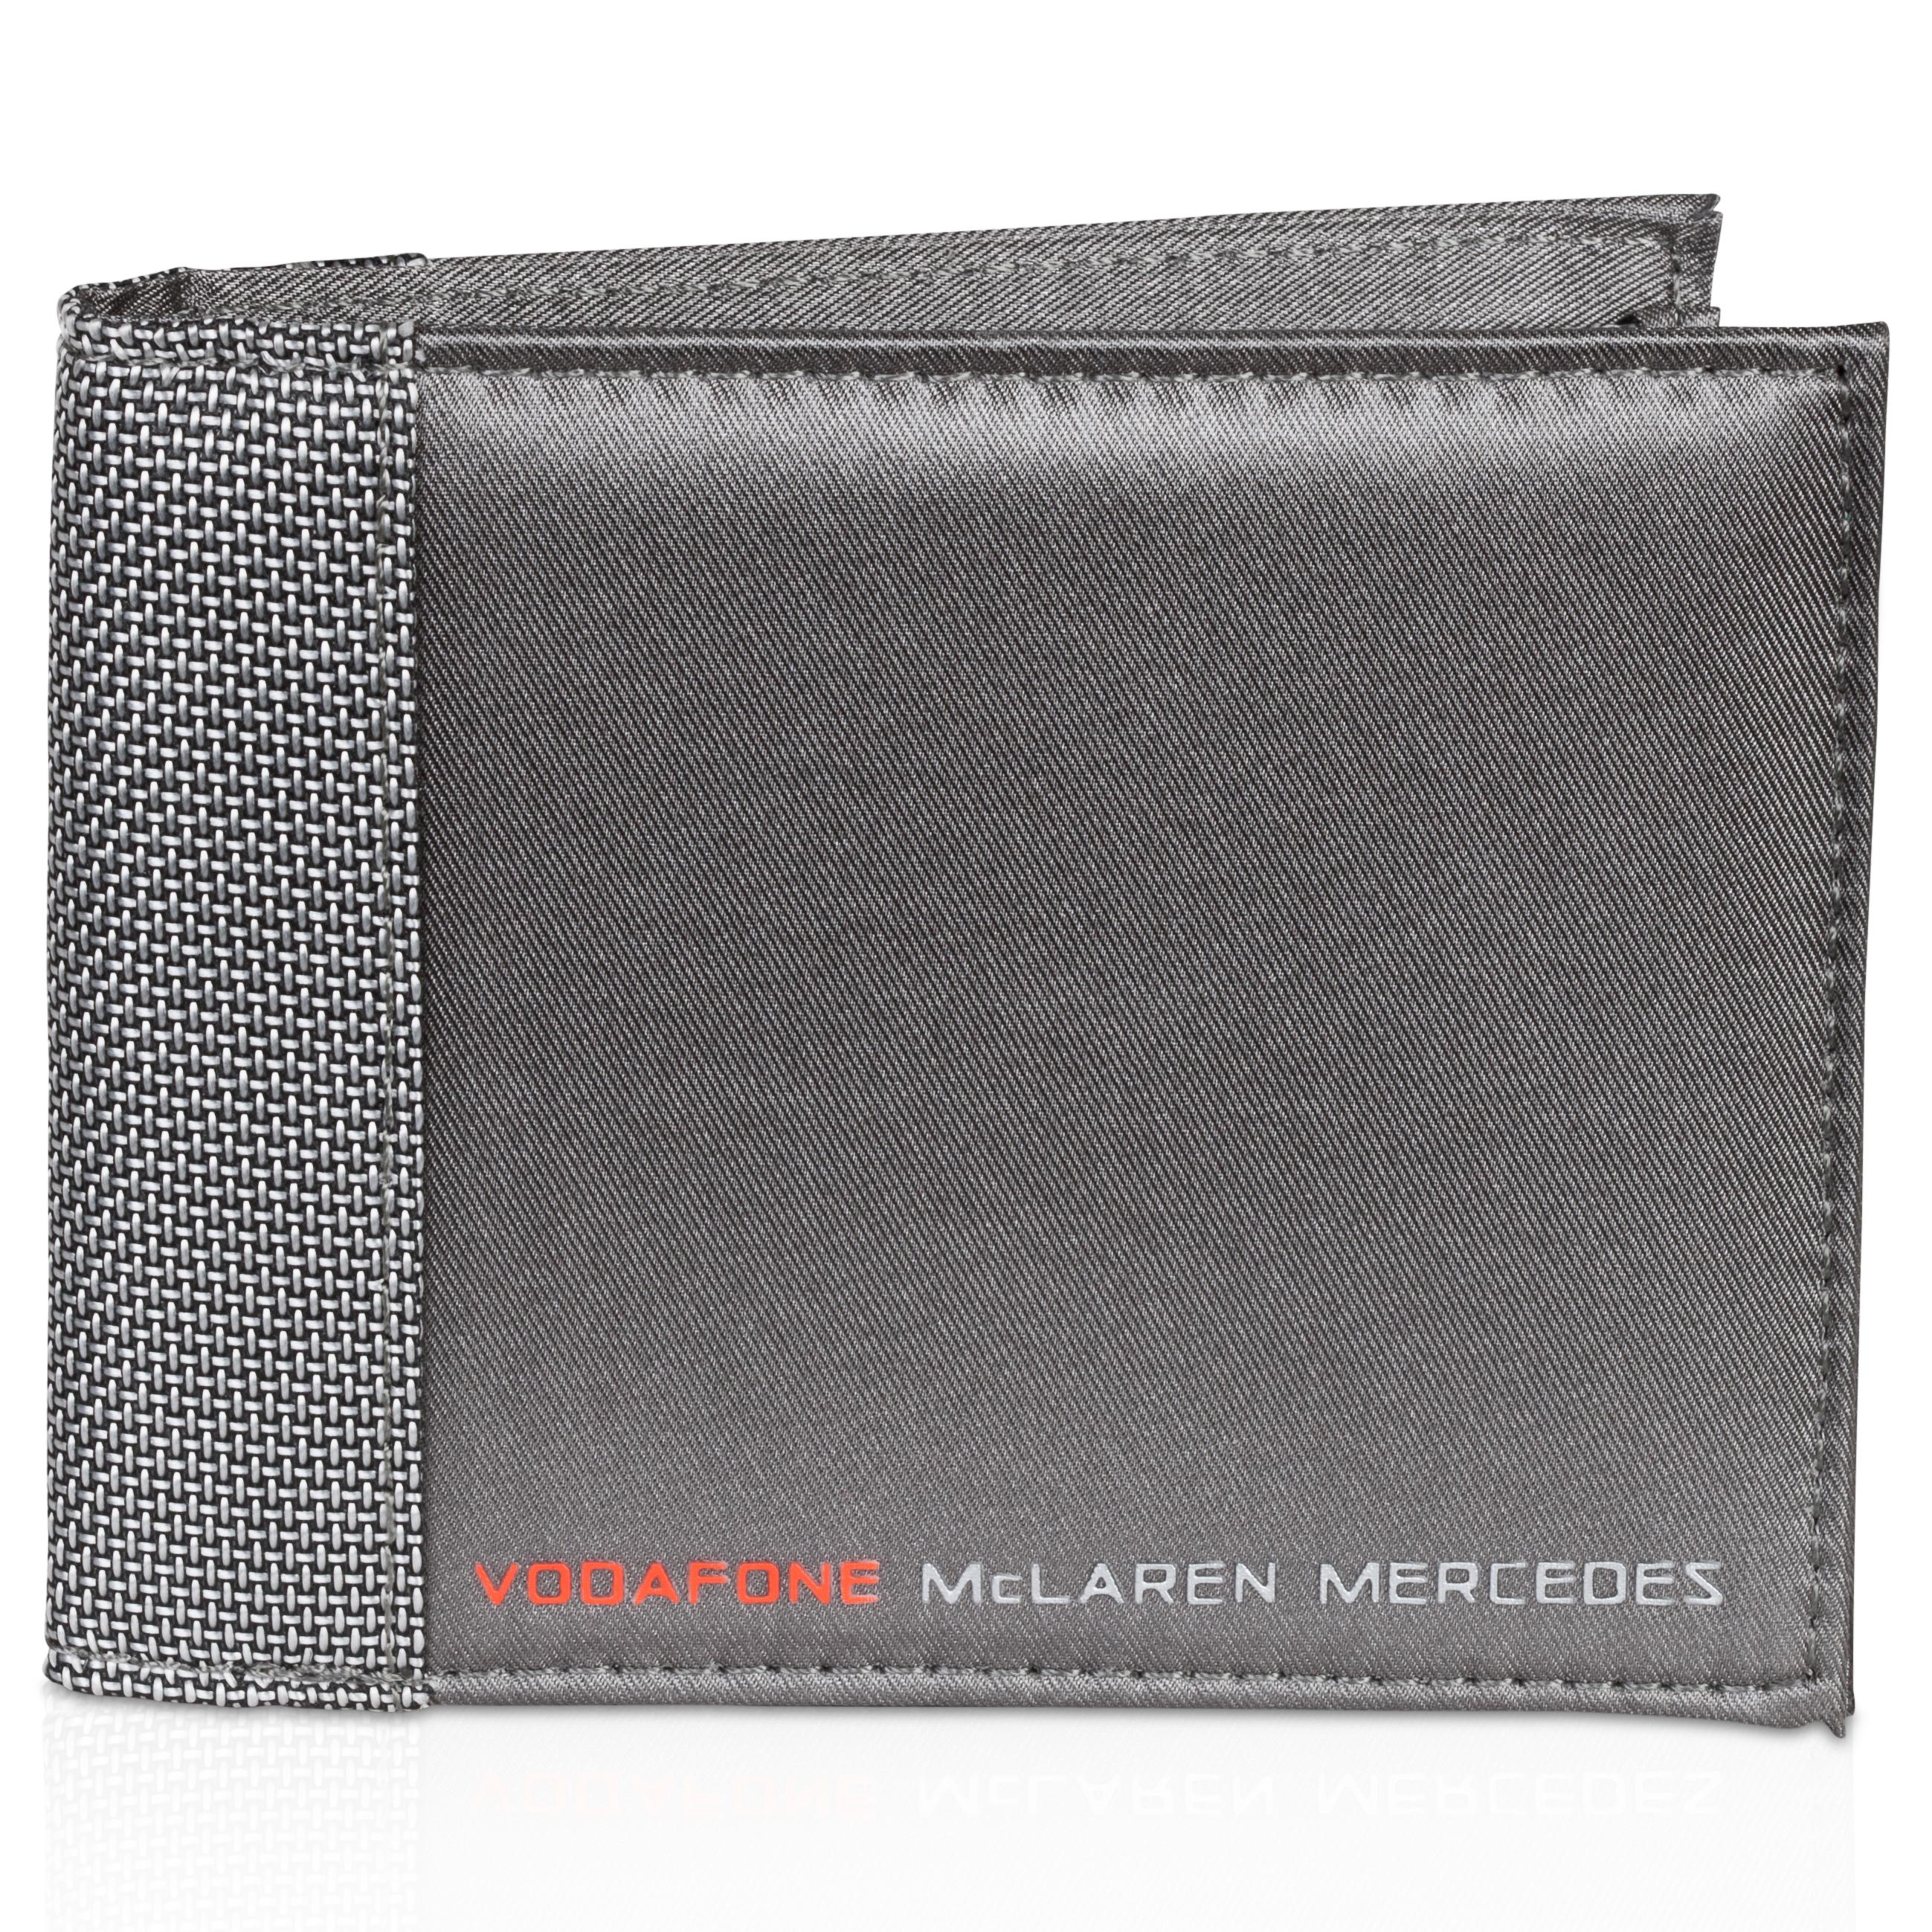 Vodafone McLaren Mercedes Wallet